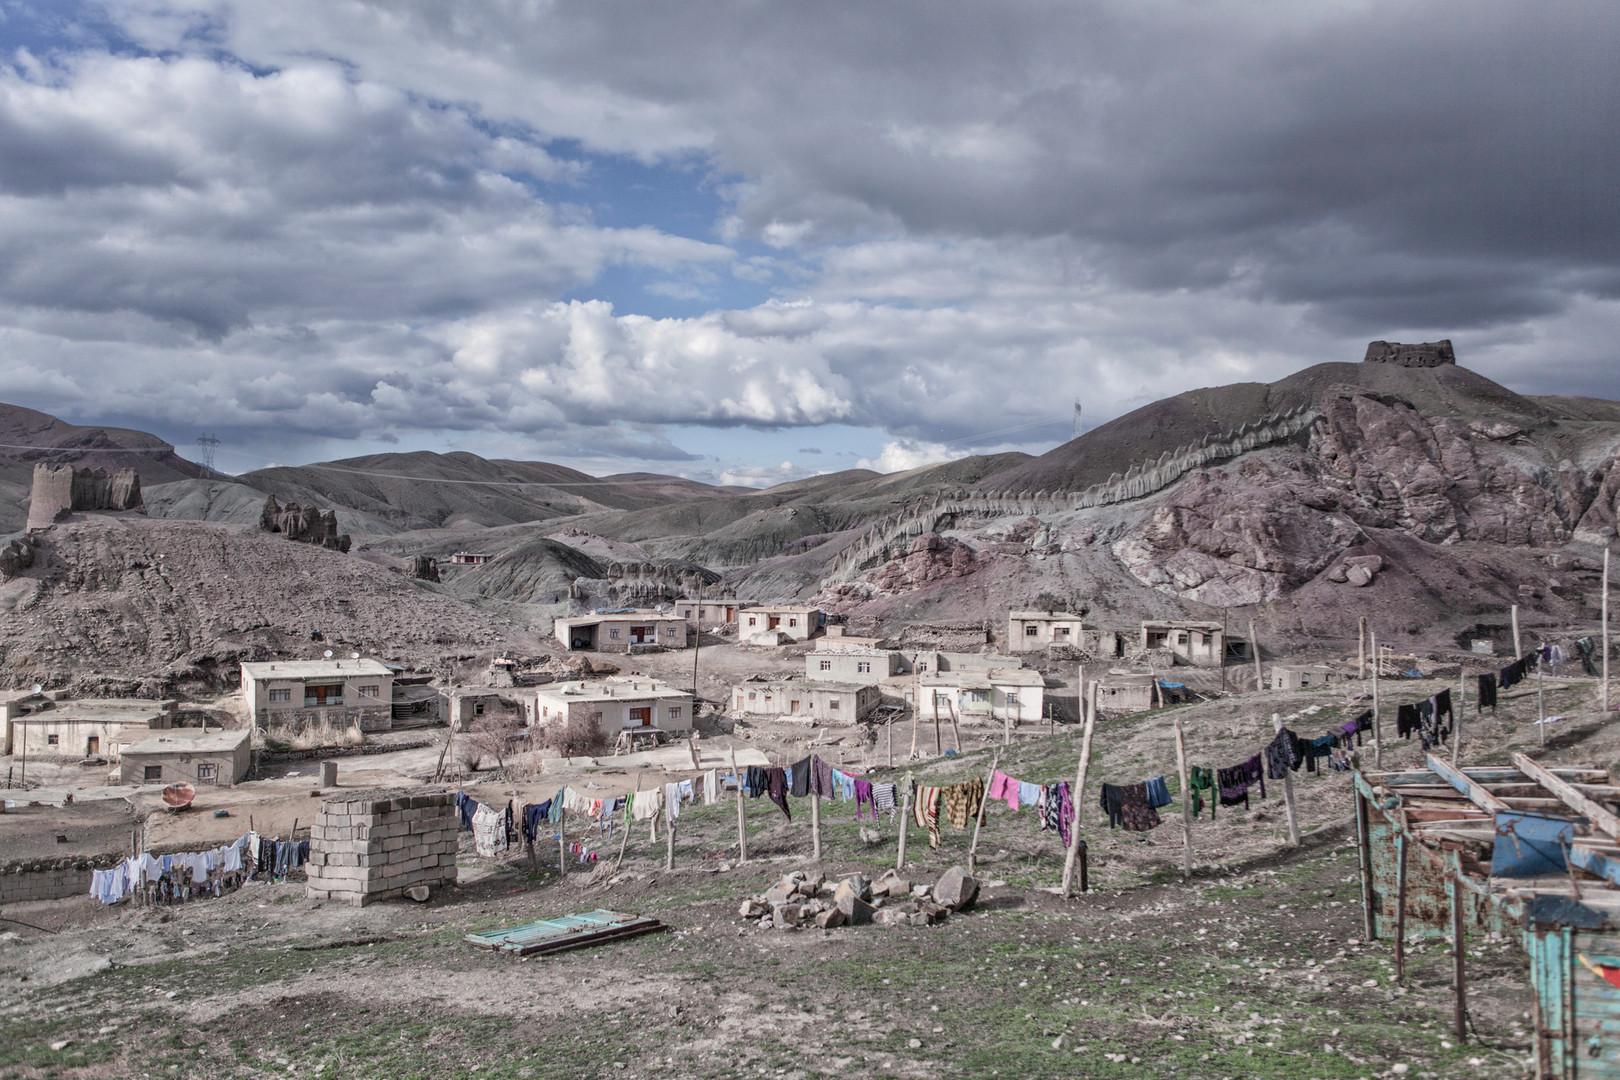 Although reinforced concrete houses became widespread in villages, adobe houses still exist. Hosap, Van. April  2011.